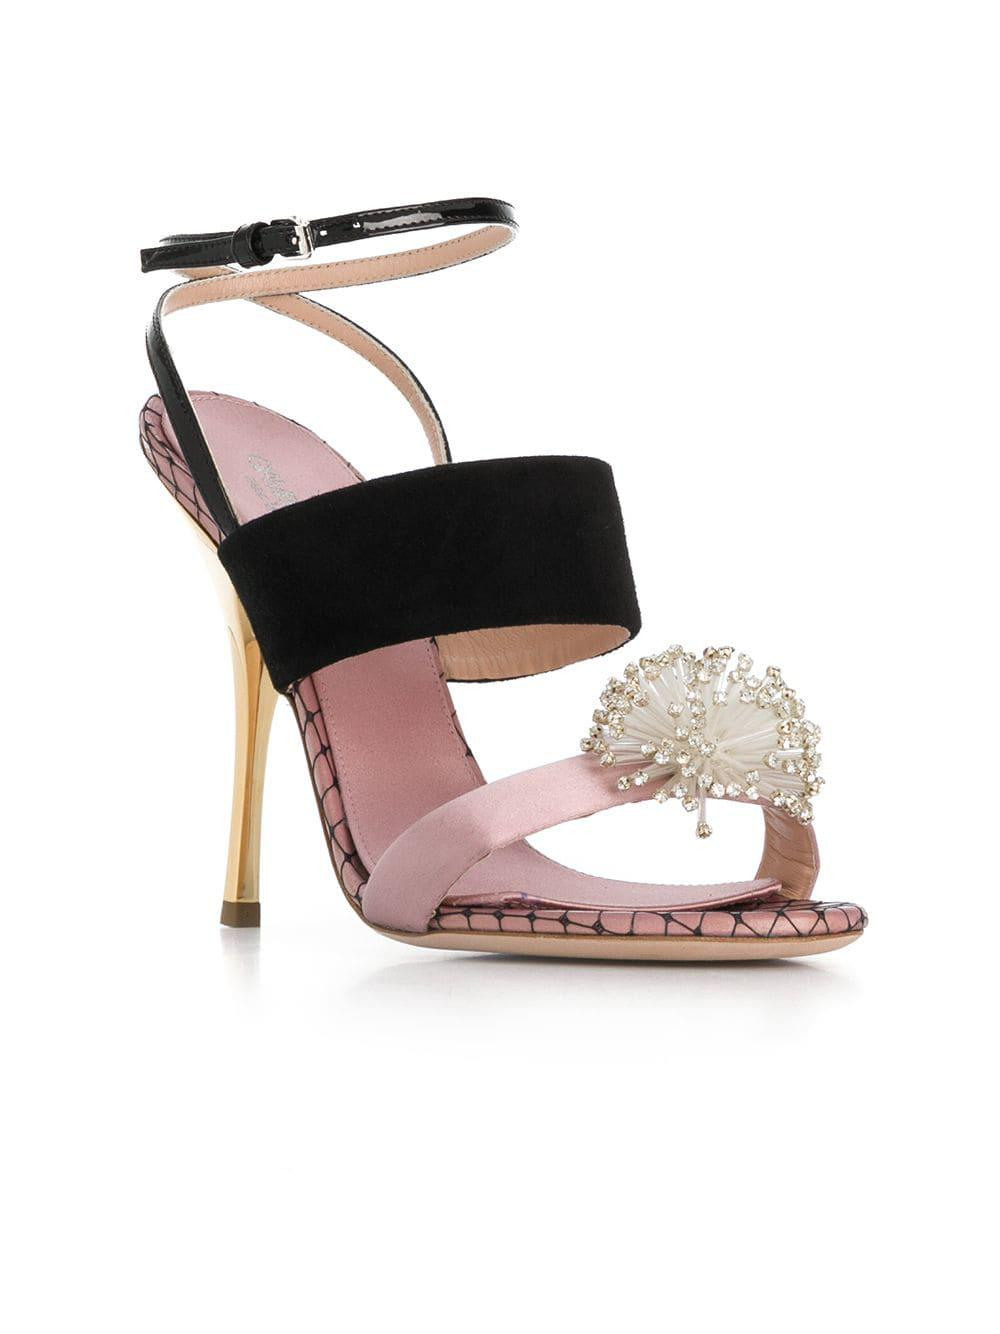 39b538392518 Lyst - Giambattista Valli Crystal Embellished Sandals in Pink - Save  0.750938673341679%